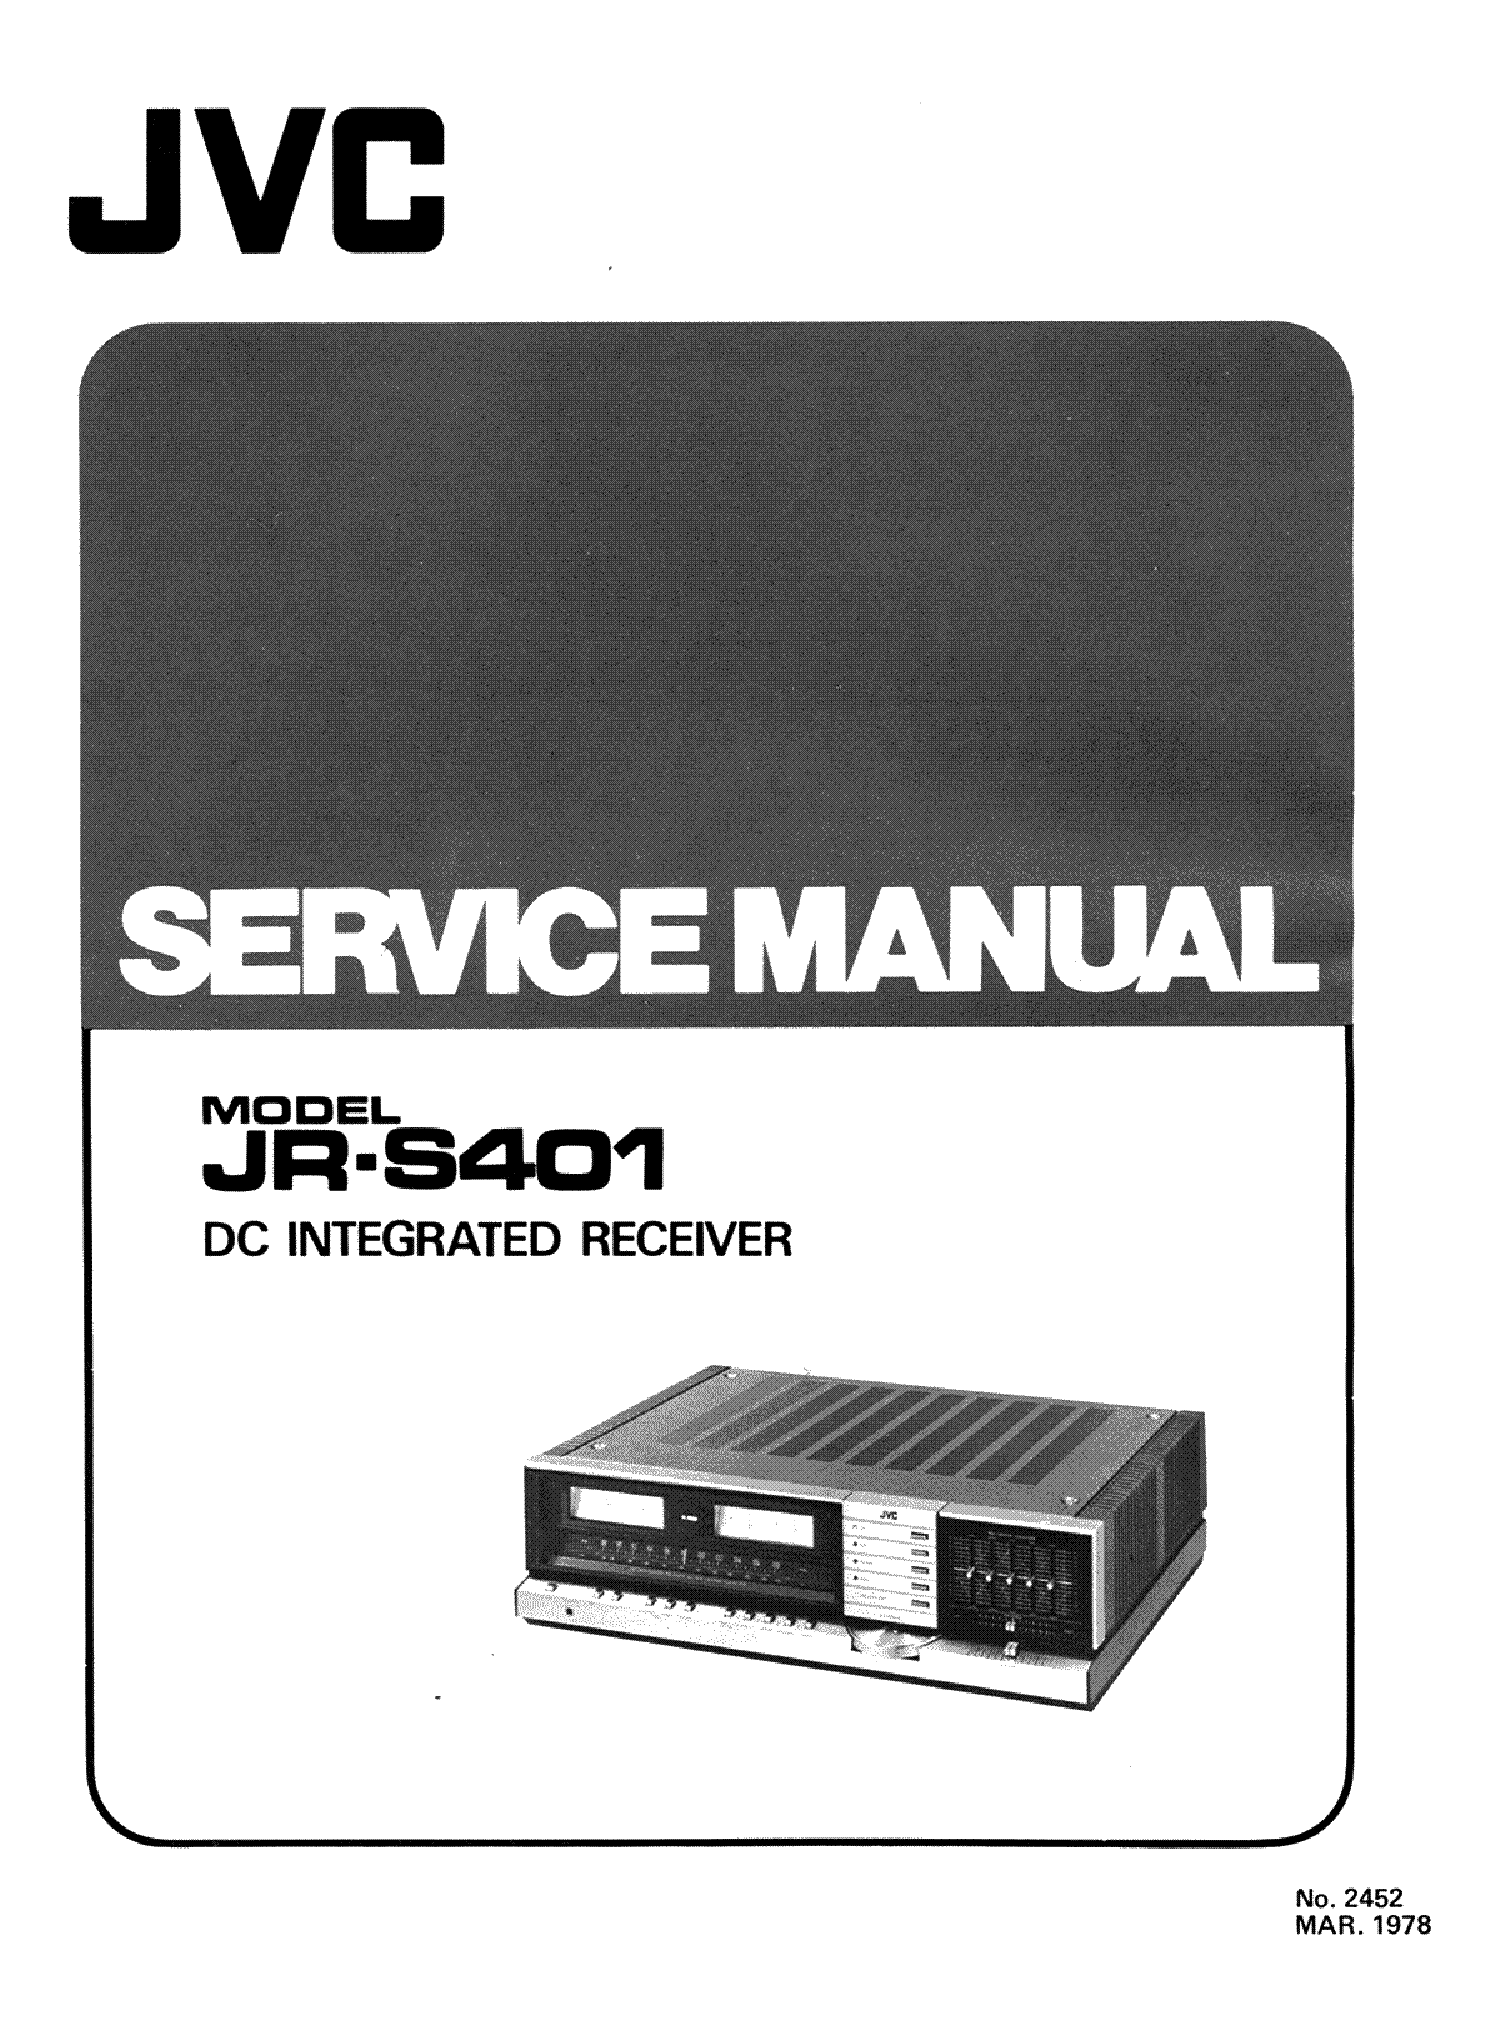 JVC JR-S401 service manual (1st page)